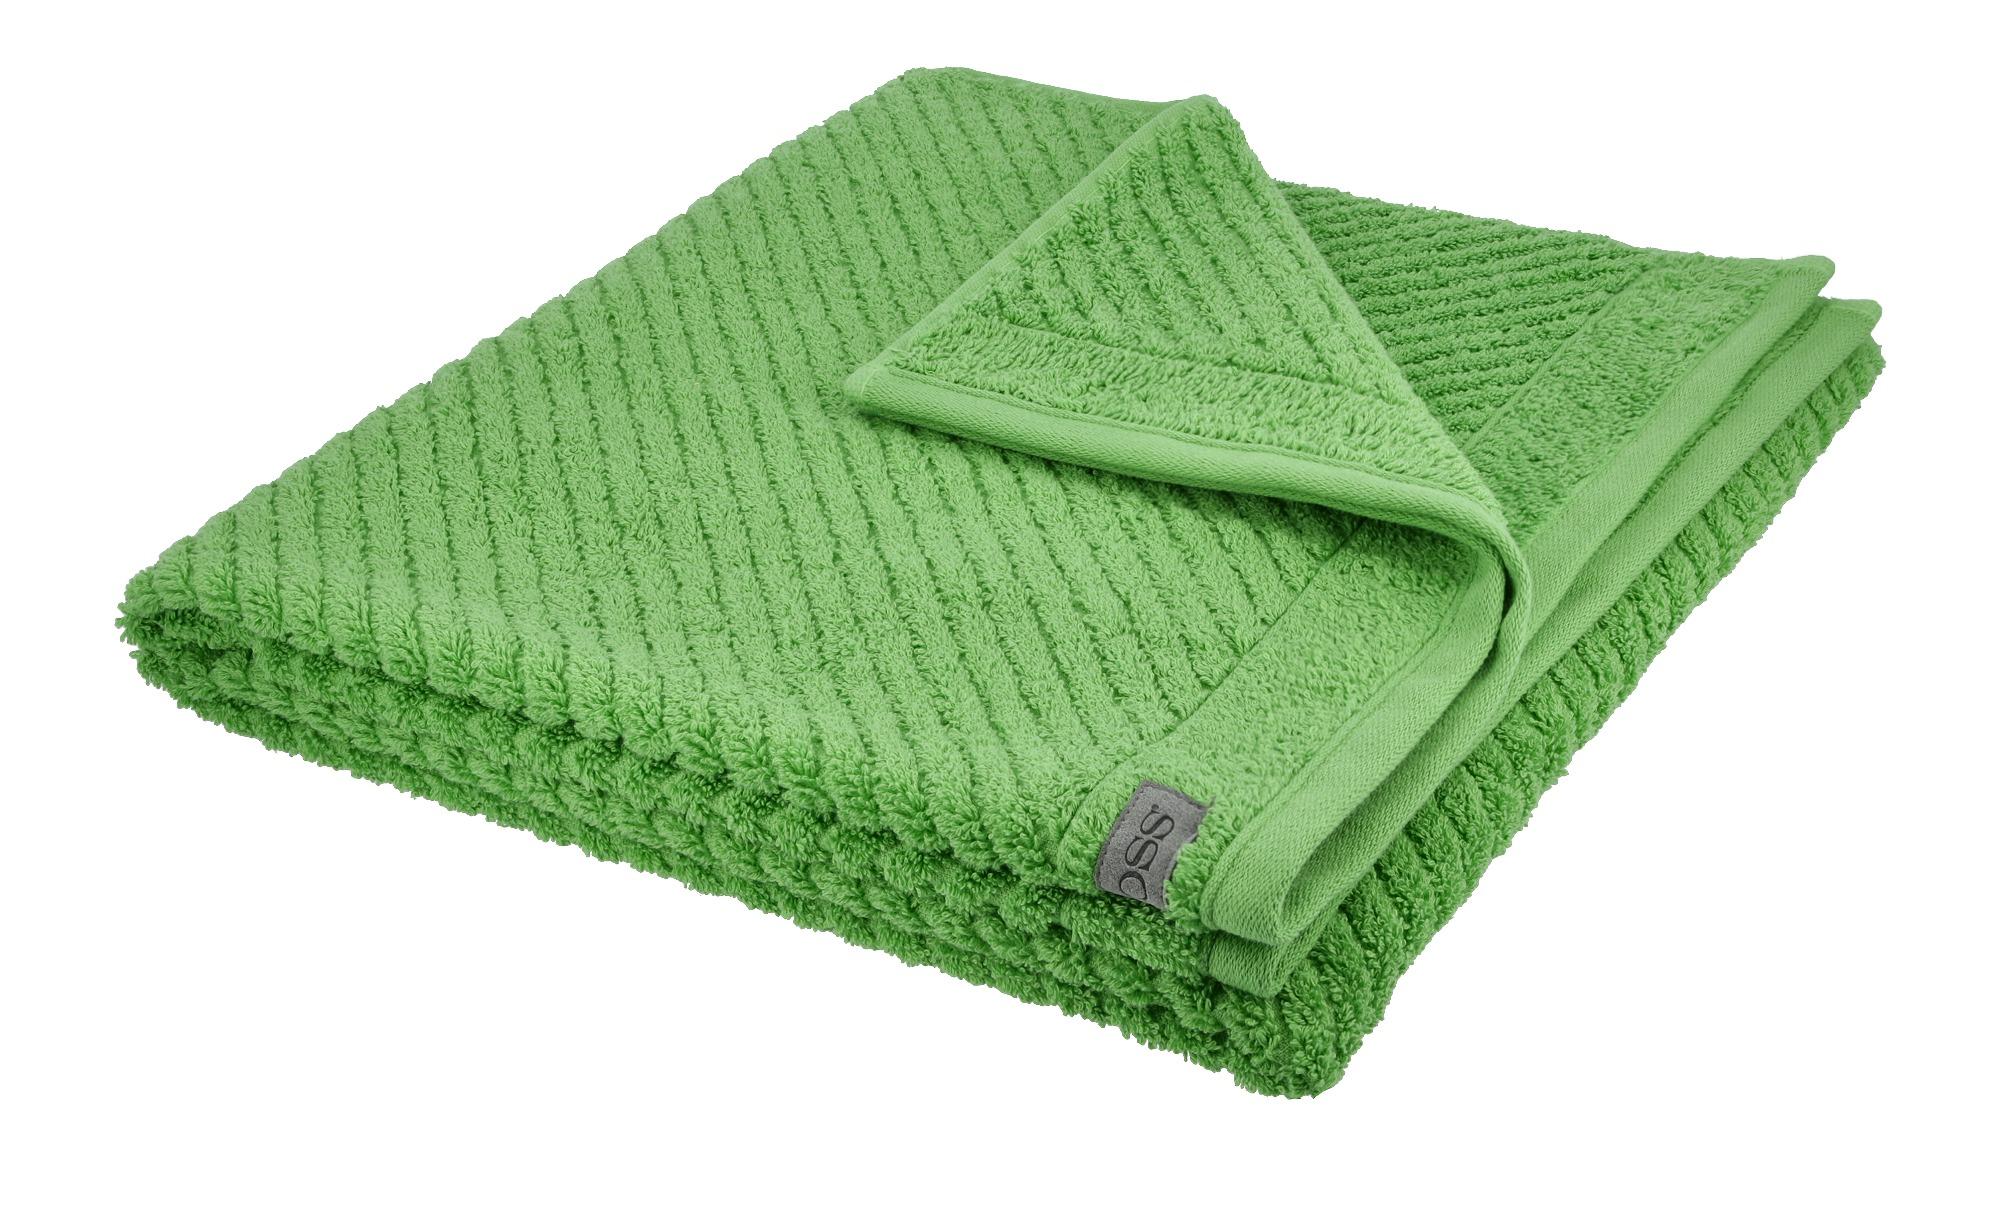 Ross Duschtuch  4006 ¦ grün ¦ 100% Baumwolle Badtextilien und Zubehör > Handtücher & Badetücher > Handtücher - Höffner